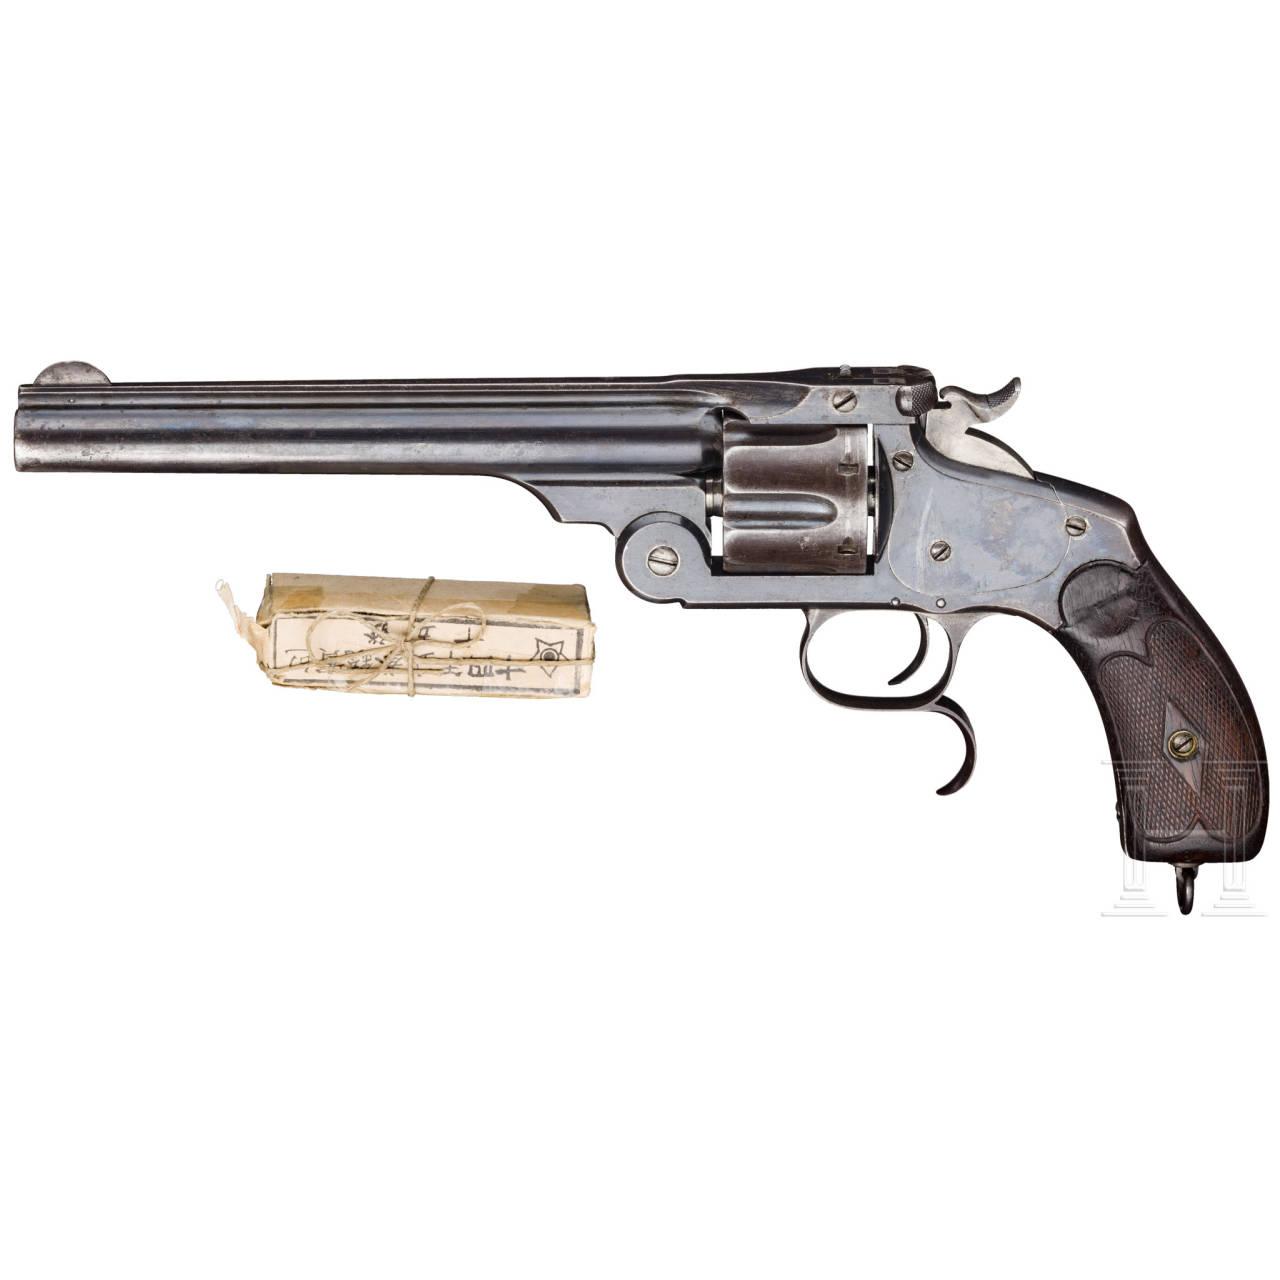 Smith & Wesson New Mod. No. 3, Marine